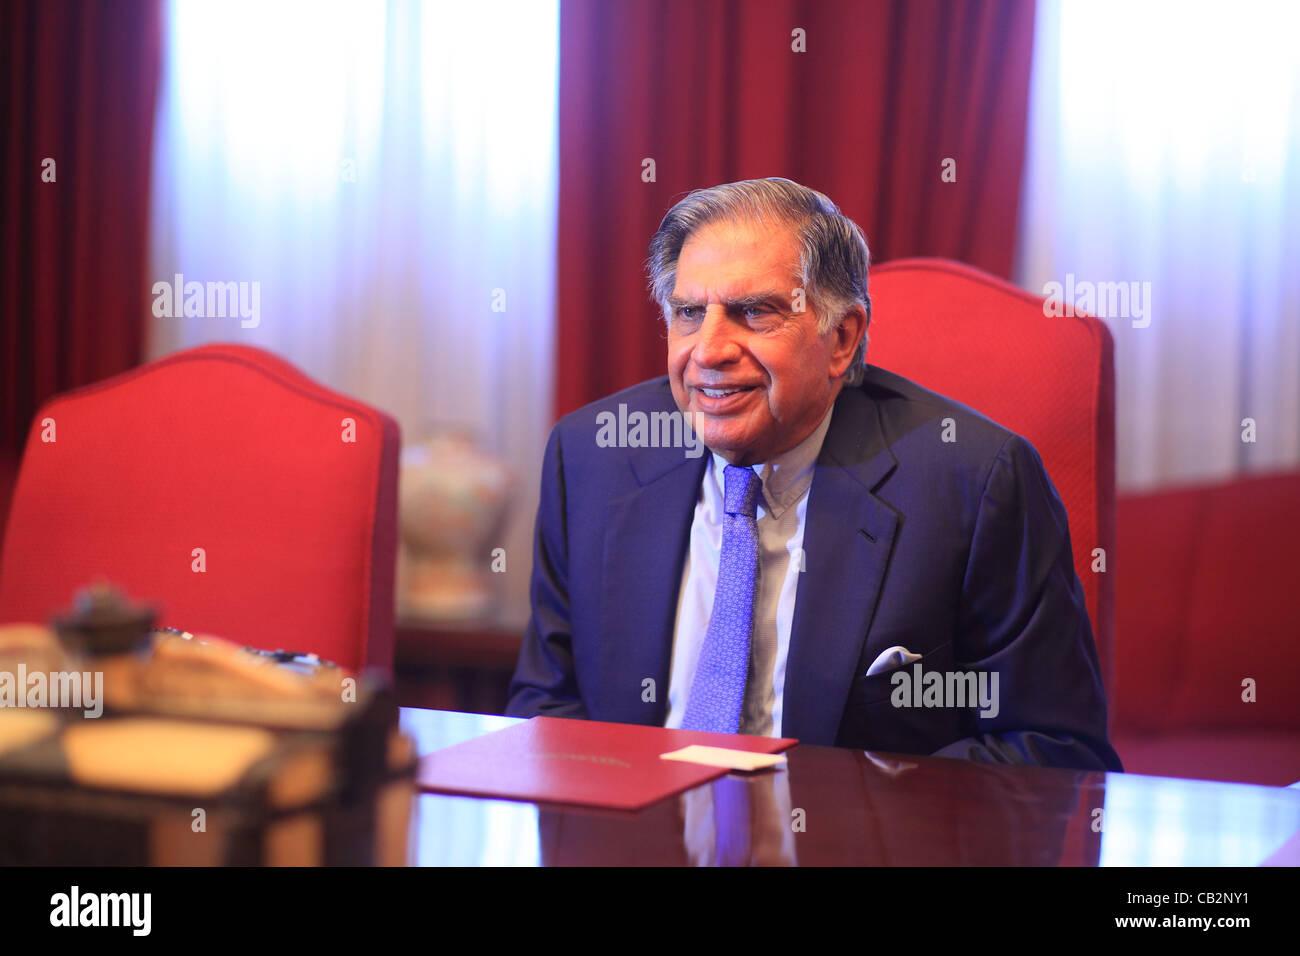 Mayo16,2012 - Mumbai, India : Retrato de Rata industrial indio Tata, Presidente de Tata empire en la Bombay House, Imagen De Stock